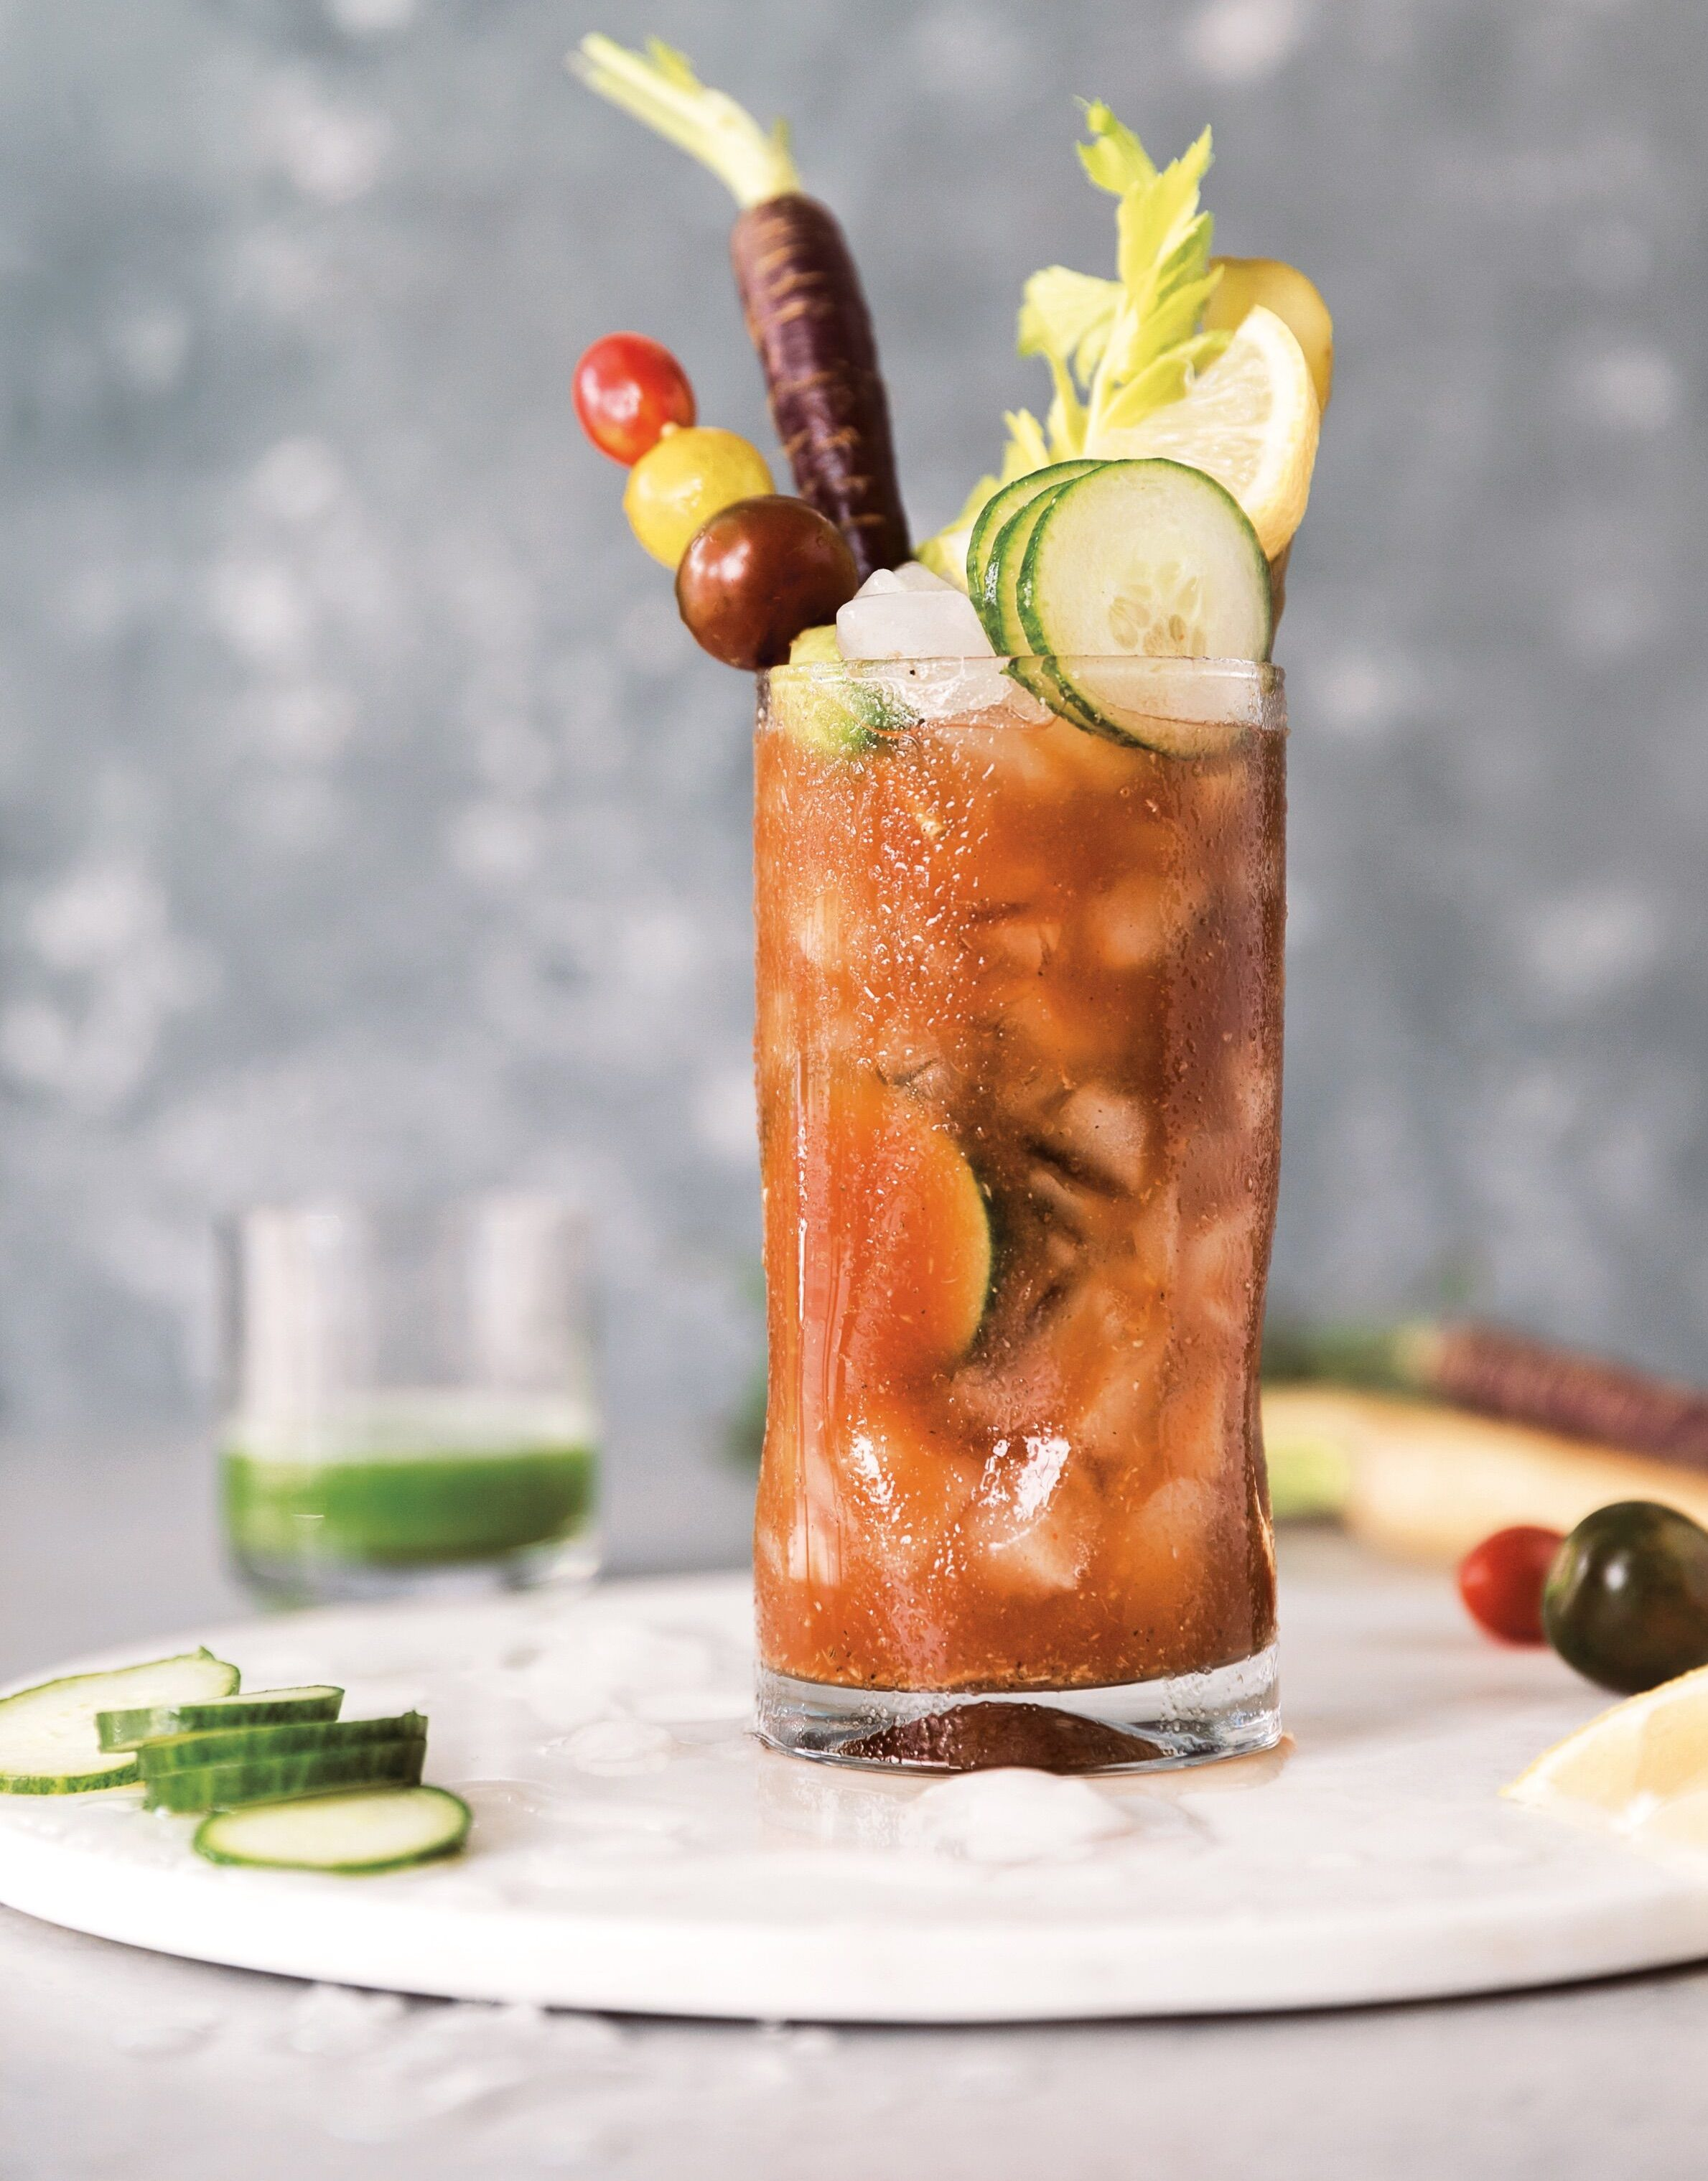 Vegan Cocktail ideas - Veggie Bloody Marys